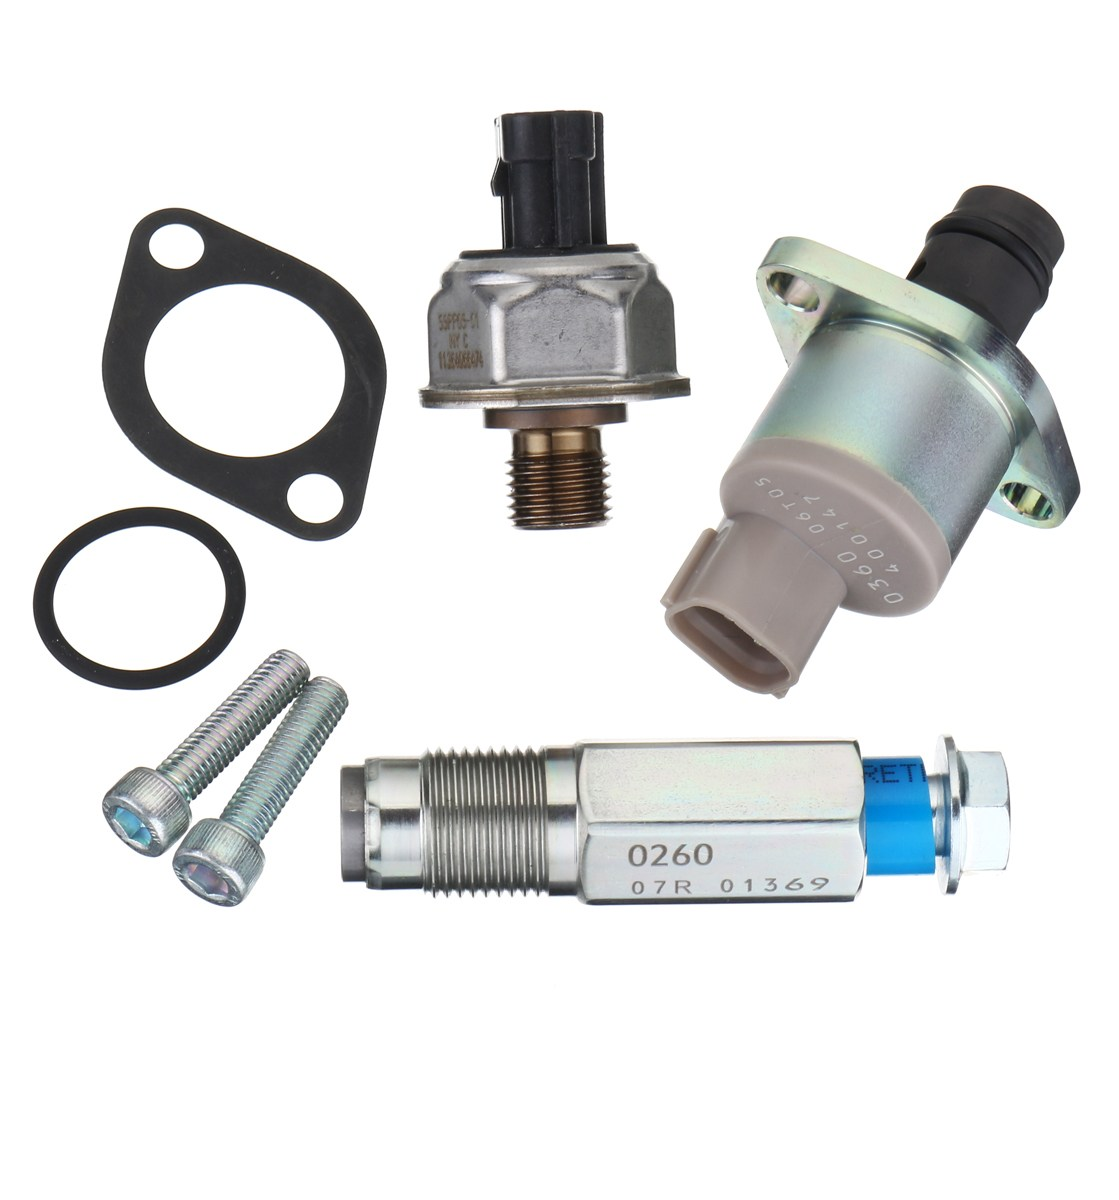 #2940090260 #55PP05-01 2.2 2.4 Fuel Pump Valve and Rail High Pressure Sensor For Ford/Fiat/Citroen/Peugeot/Land Rover Transit стоимость